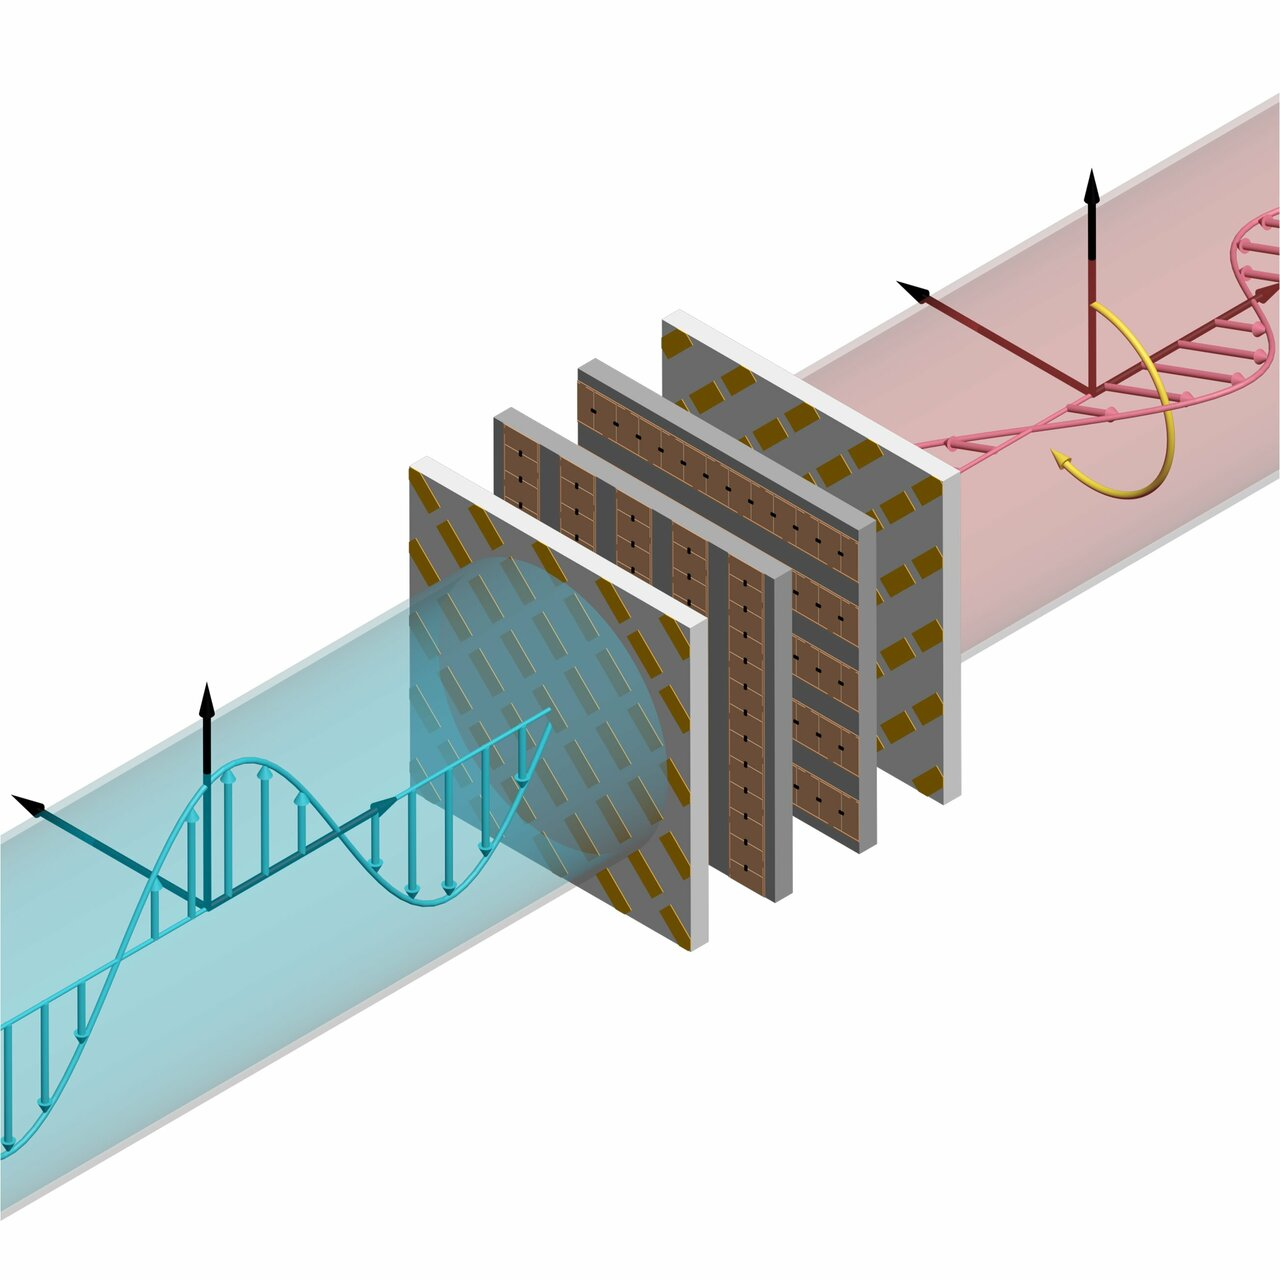 An electronically tunable metasurface that rotates polarization